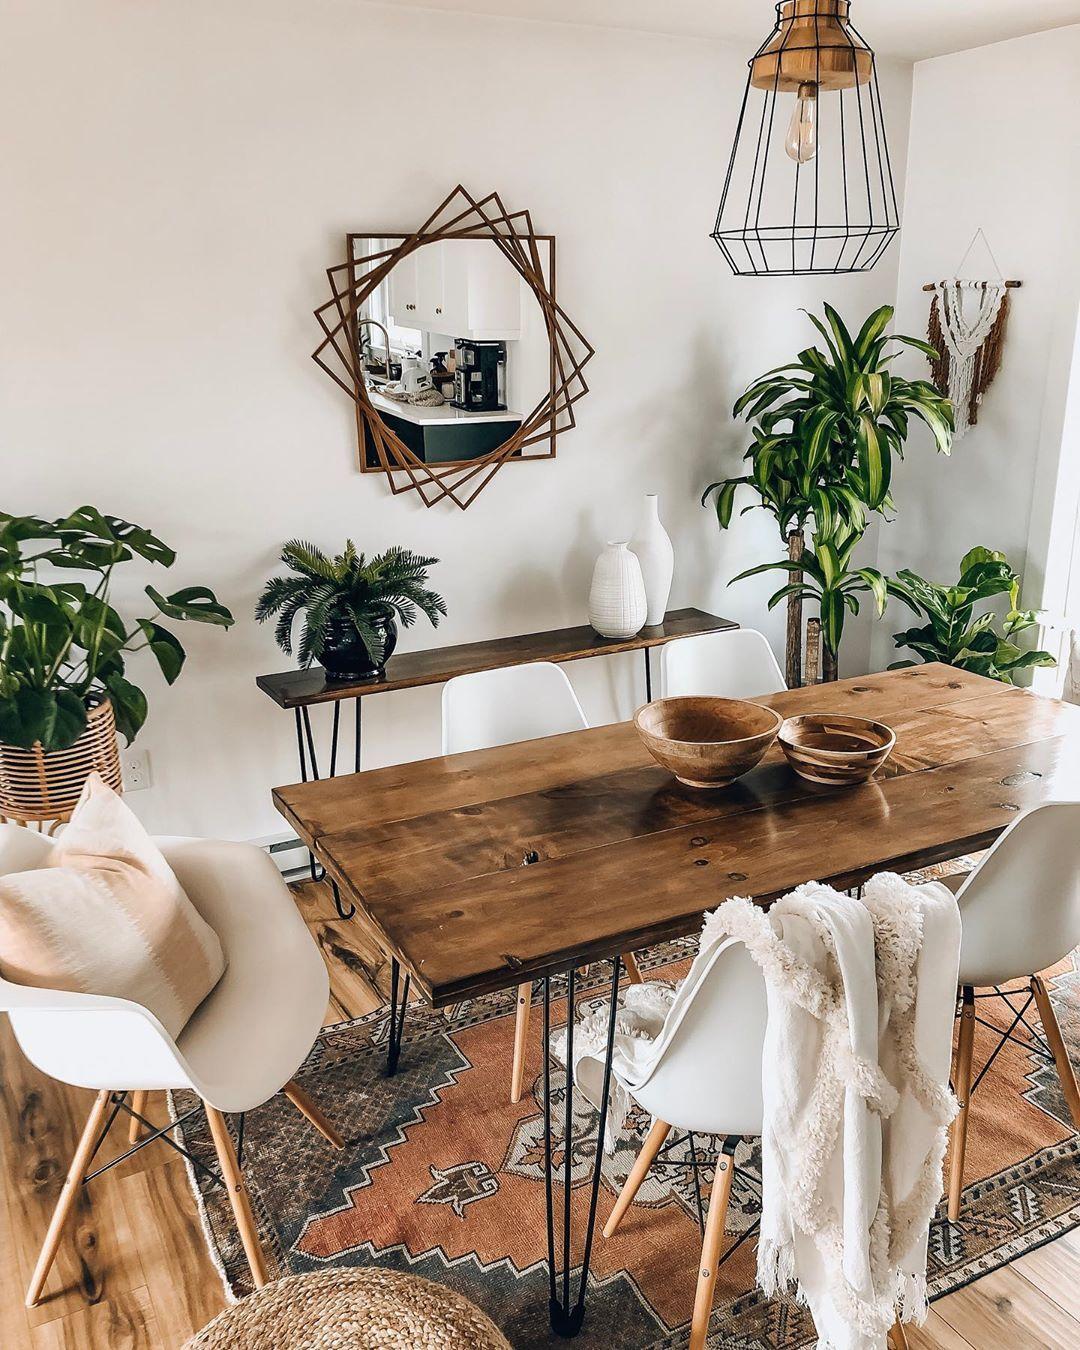 Balkongestaltung Ideen Frisch 4531 Best Decorate Images In 2019